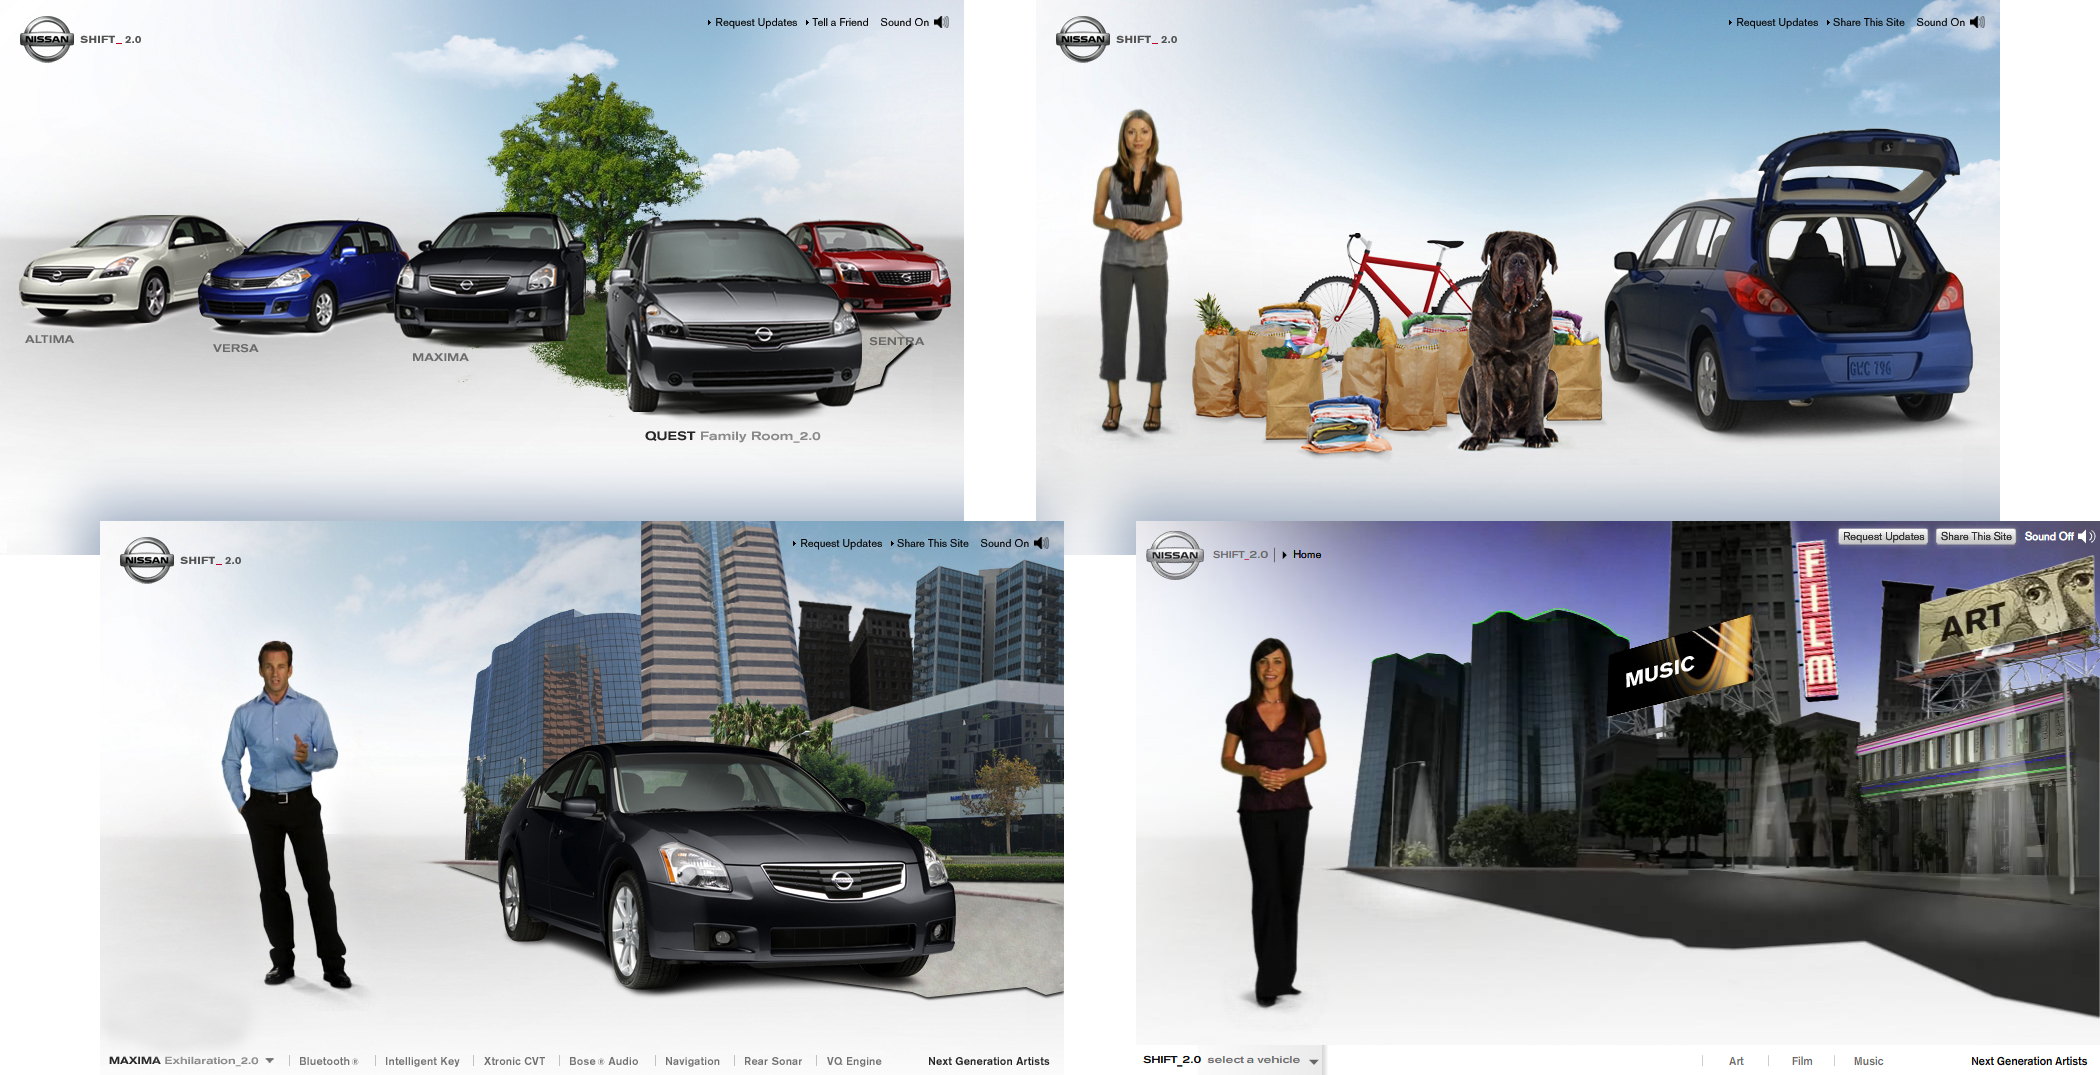 Nissan SHIFT_2.0 Campaign